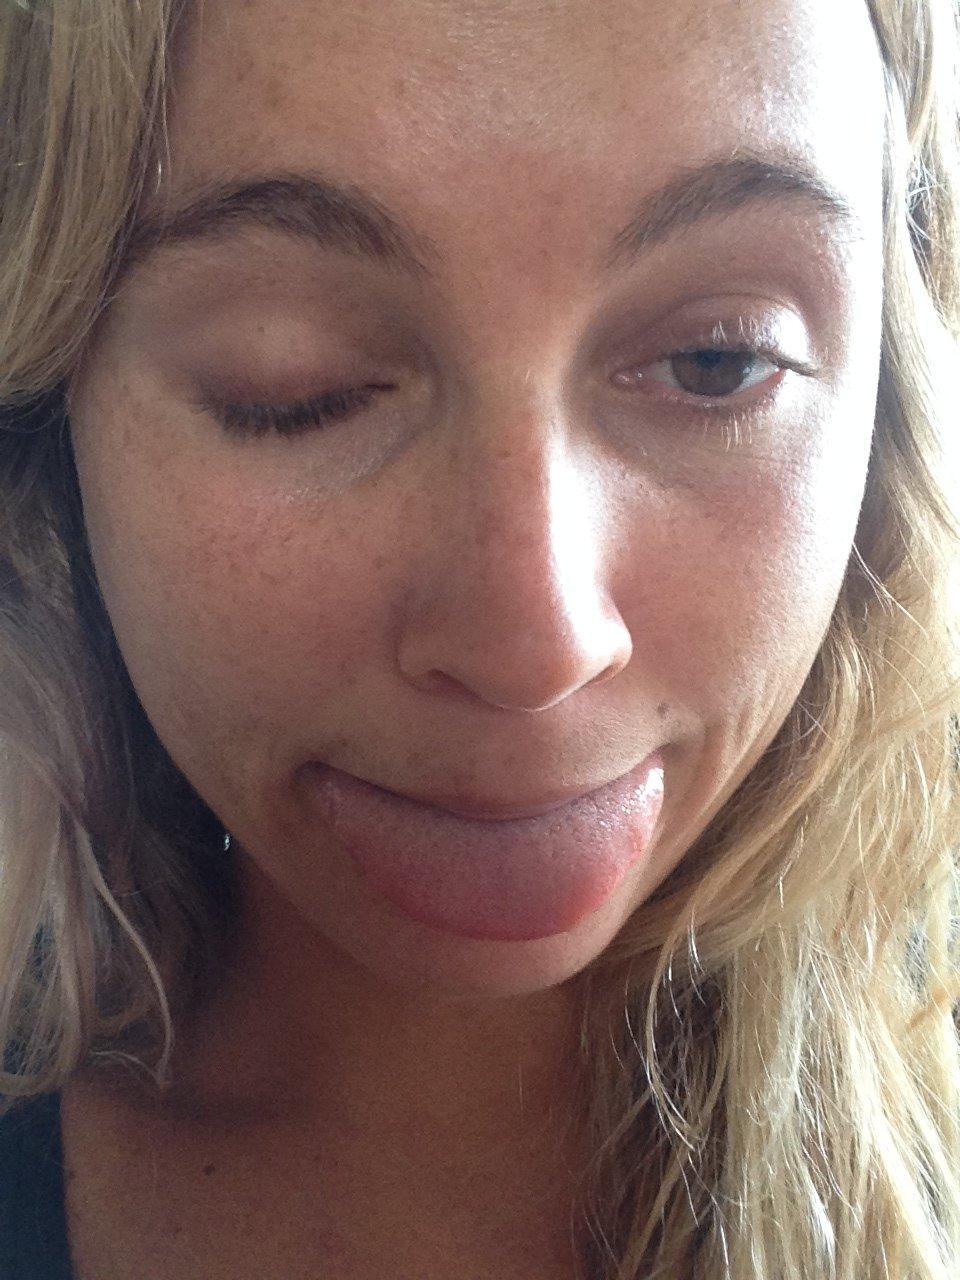 Alana Blanchard pussy pic